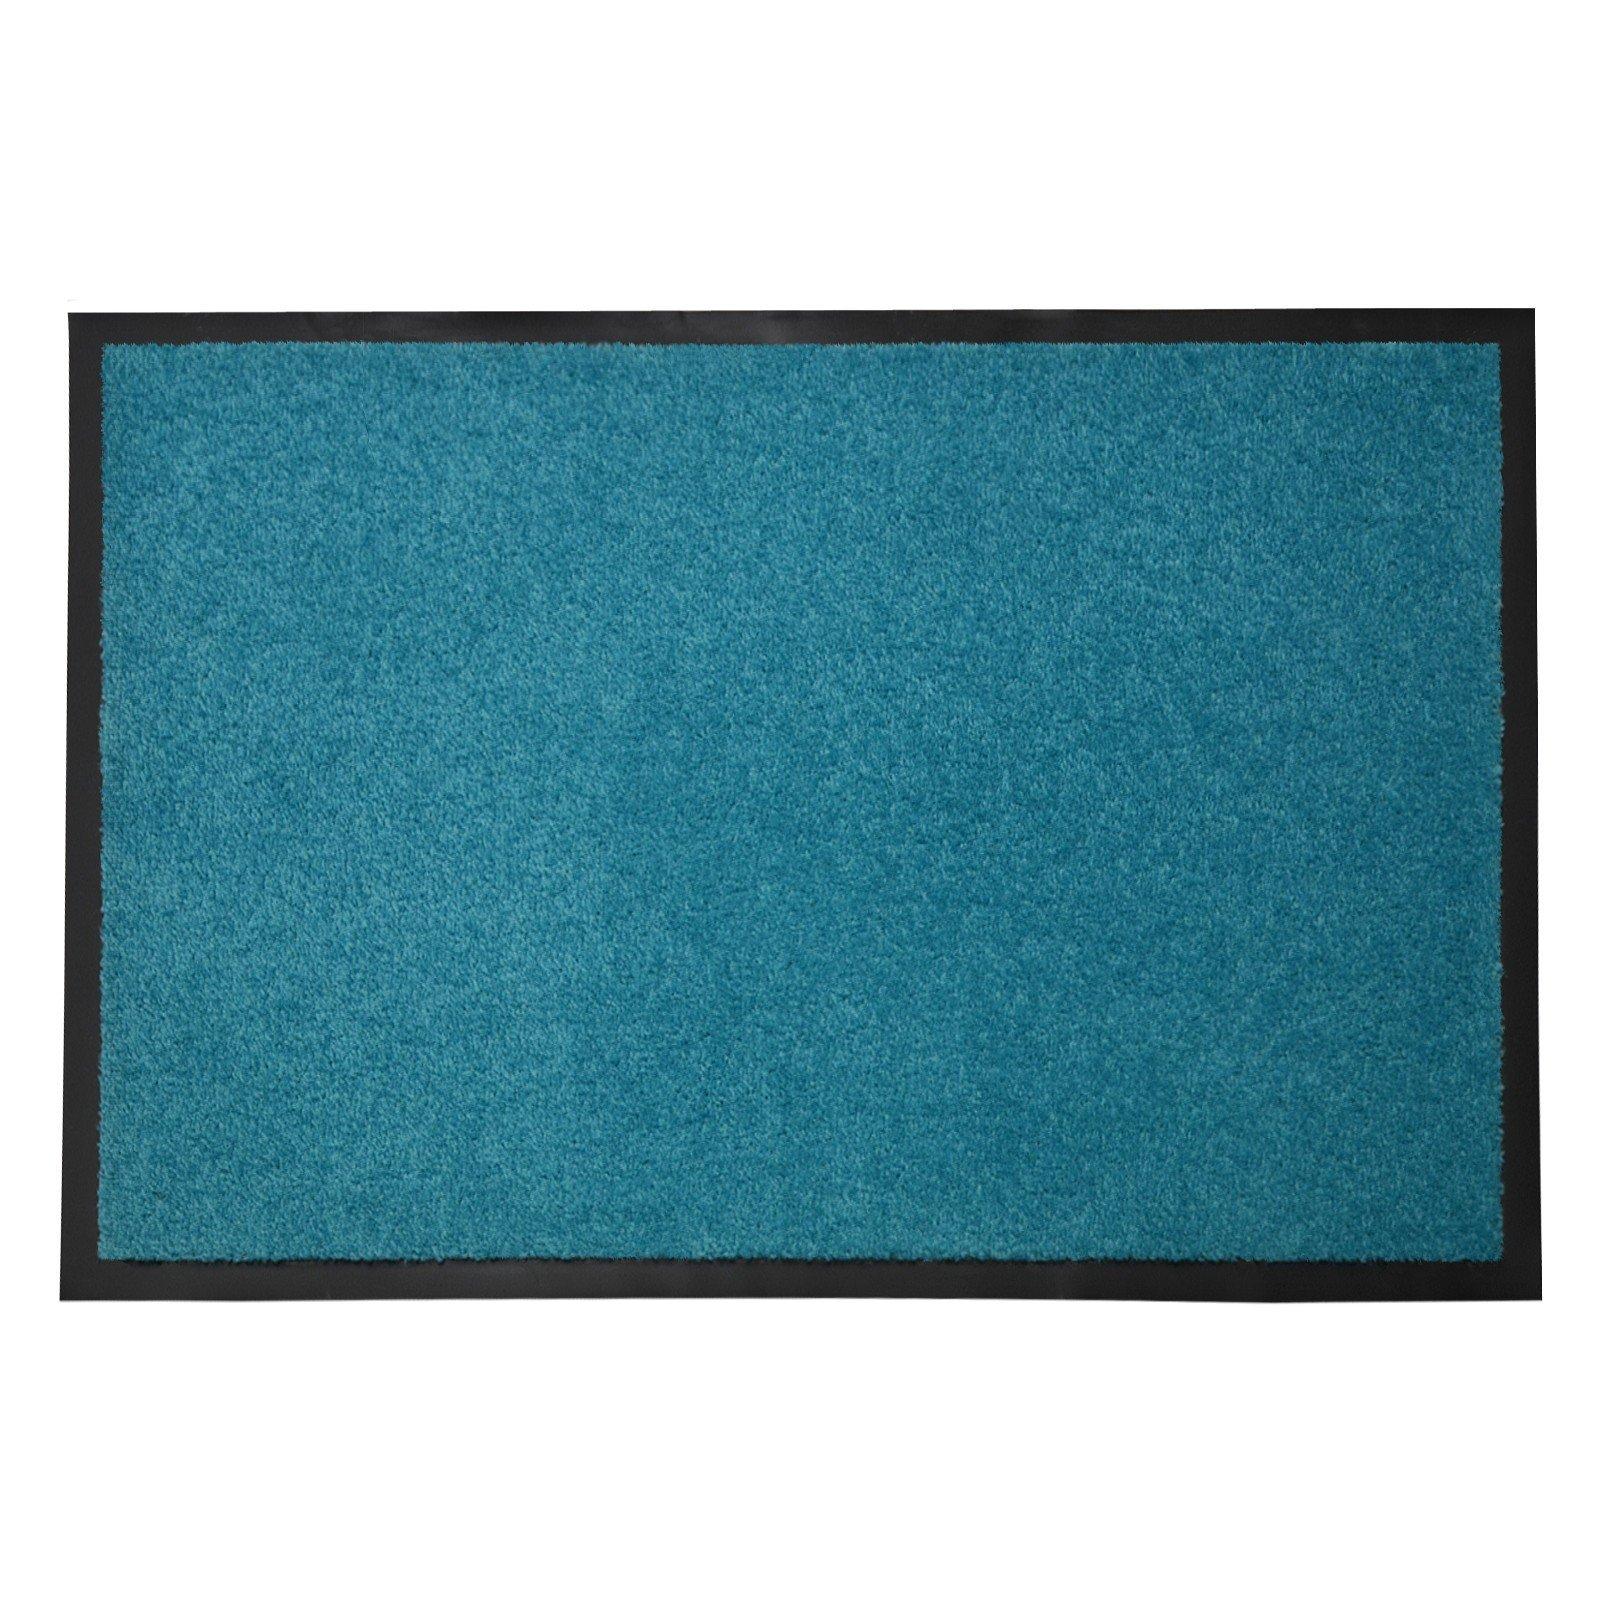 casa pura Entrance Floor Mat, Turquoise, 36'' x 48'' | Absorbent, Non-slip, Indoor/Outdoor (Multiple Sizes)